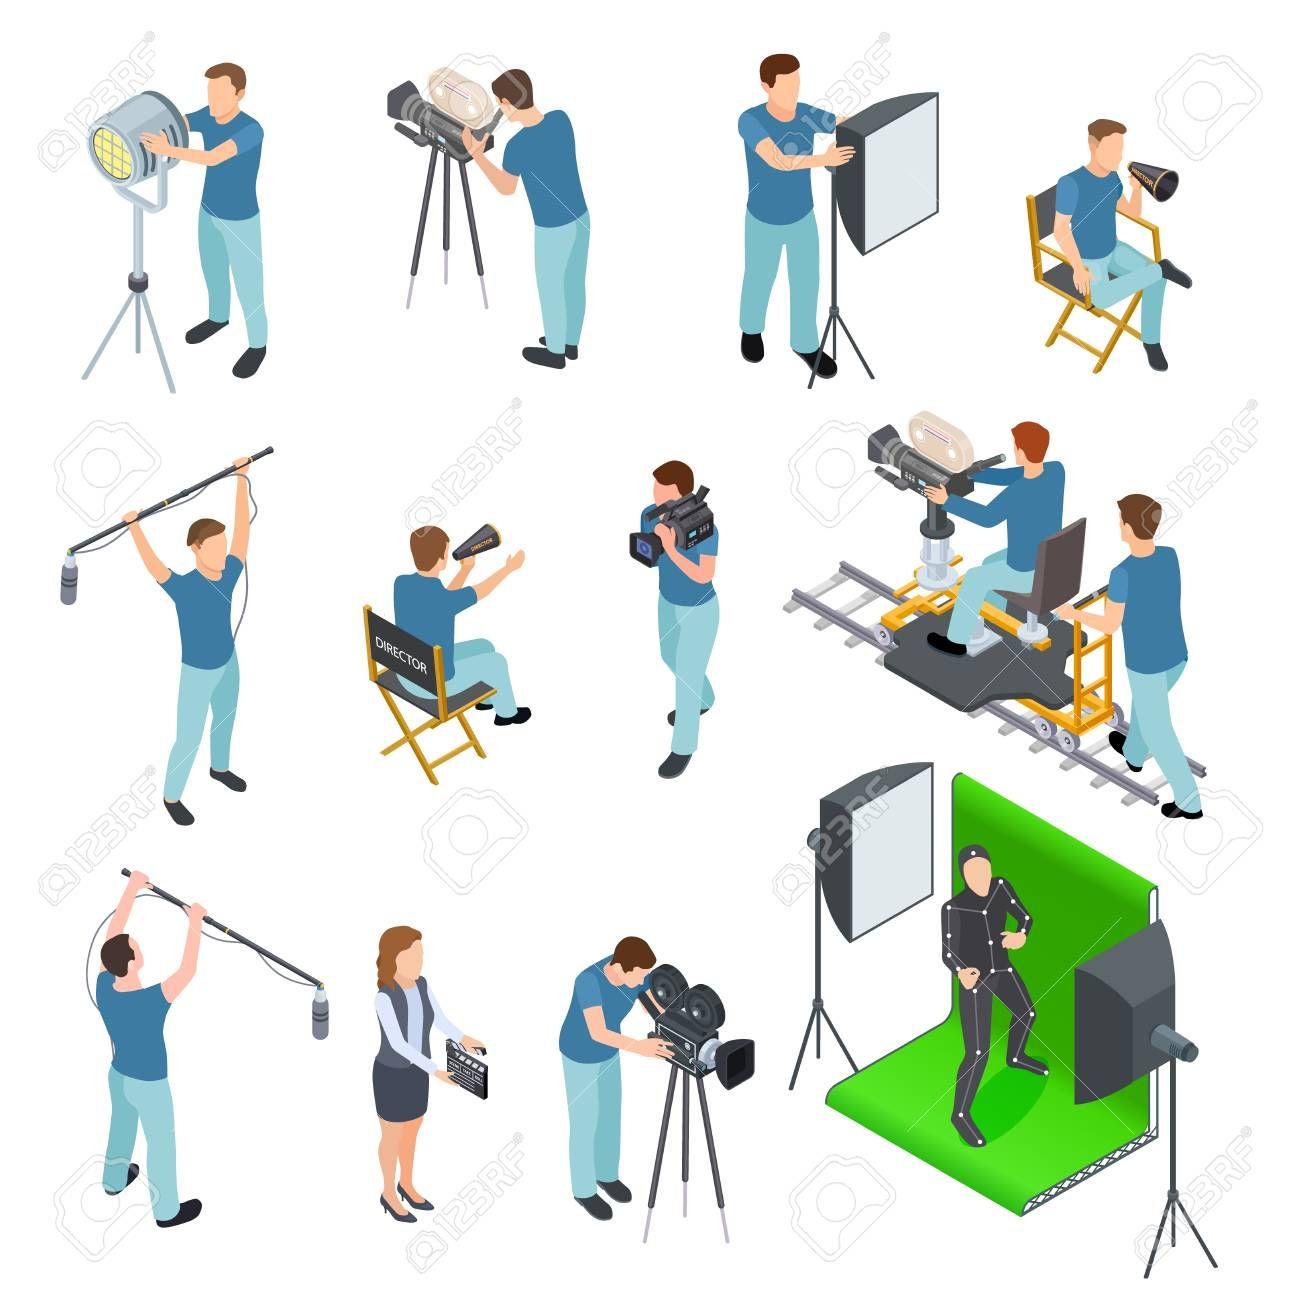 Cinematograph Isometric Set People Work Camera Light Crew Movie Video Film Motion Production Tv Studio Green Scre Studio Green Greenscreen Camera Illustration